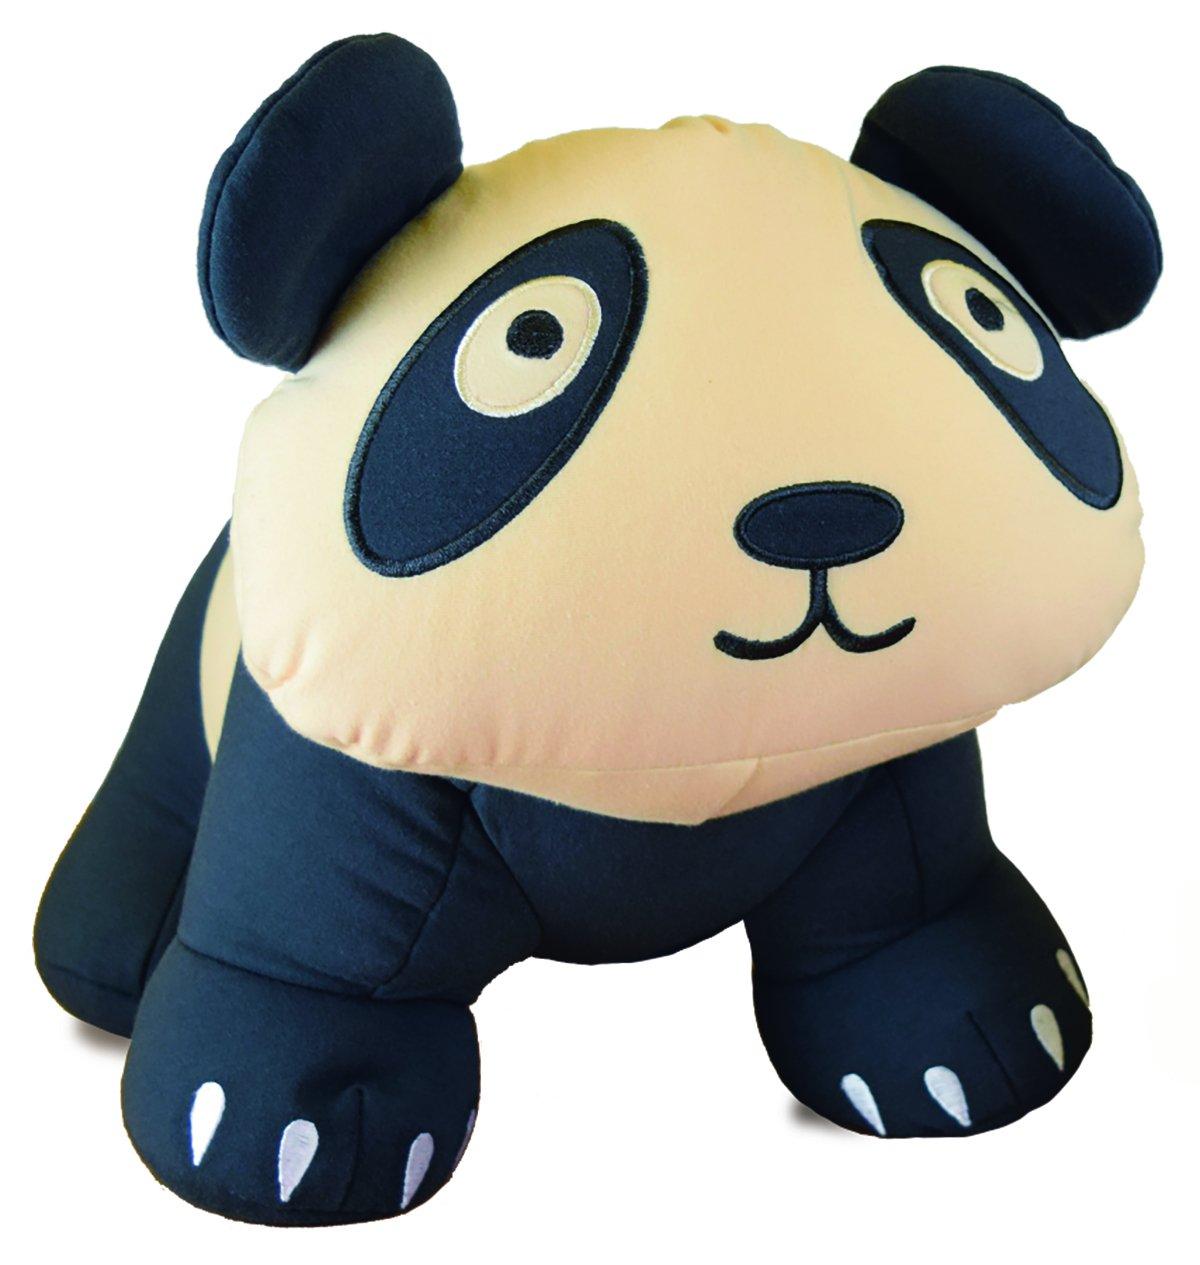 Bed or Dorm Koala Yogibo Mega Mate Huggable Jumbo Beanbag Animals for Kids Playrooms